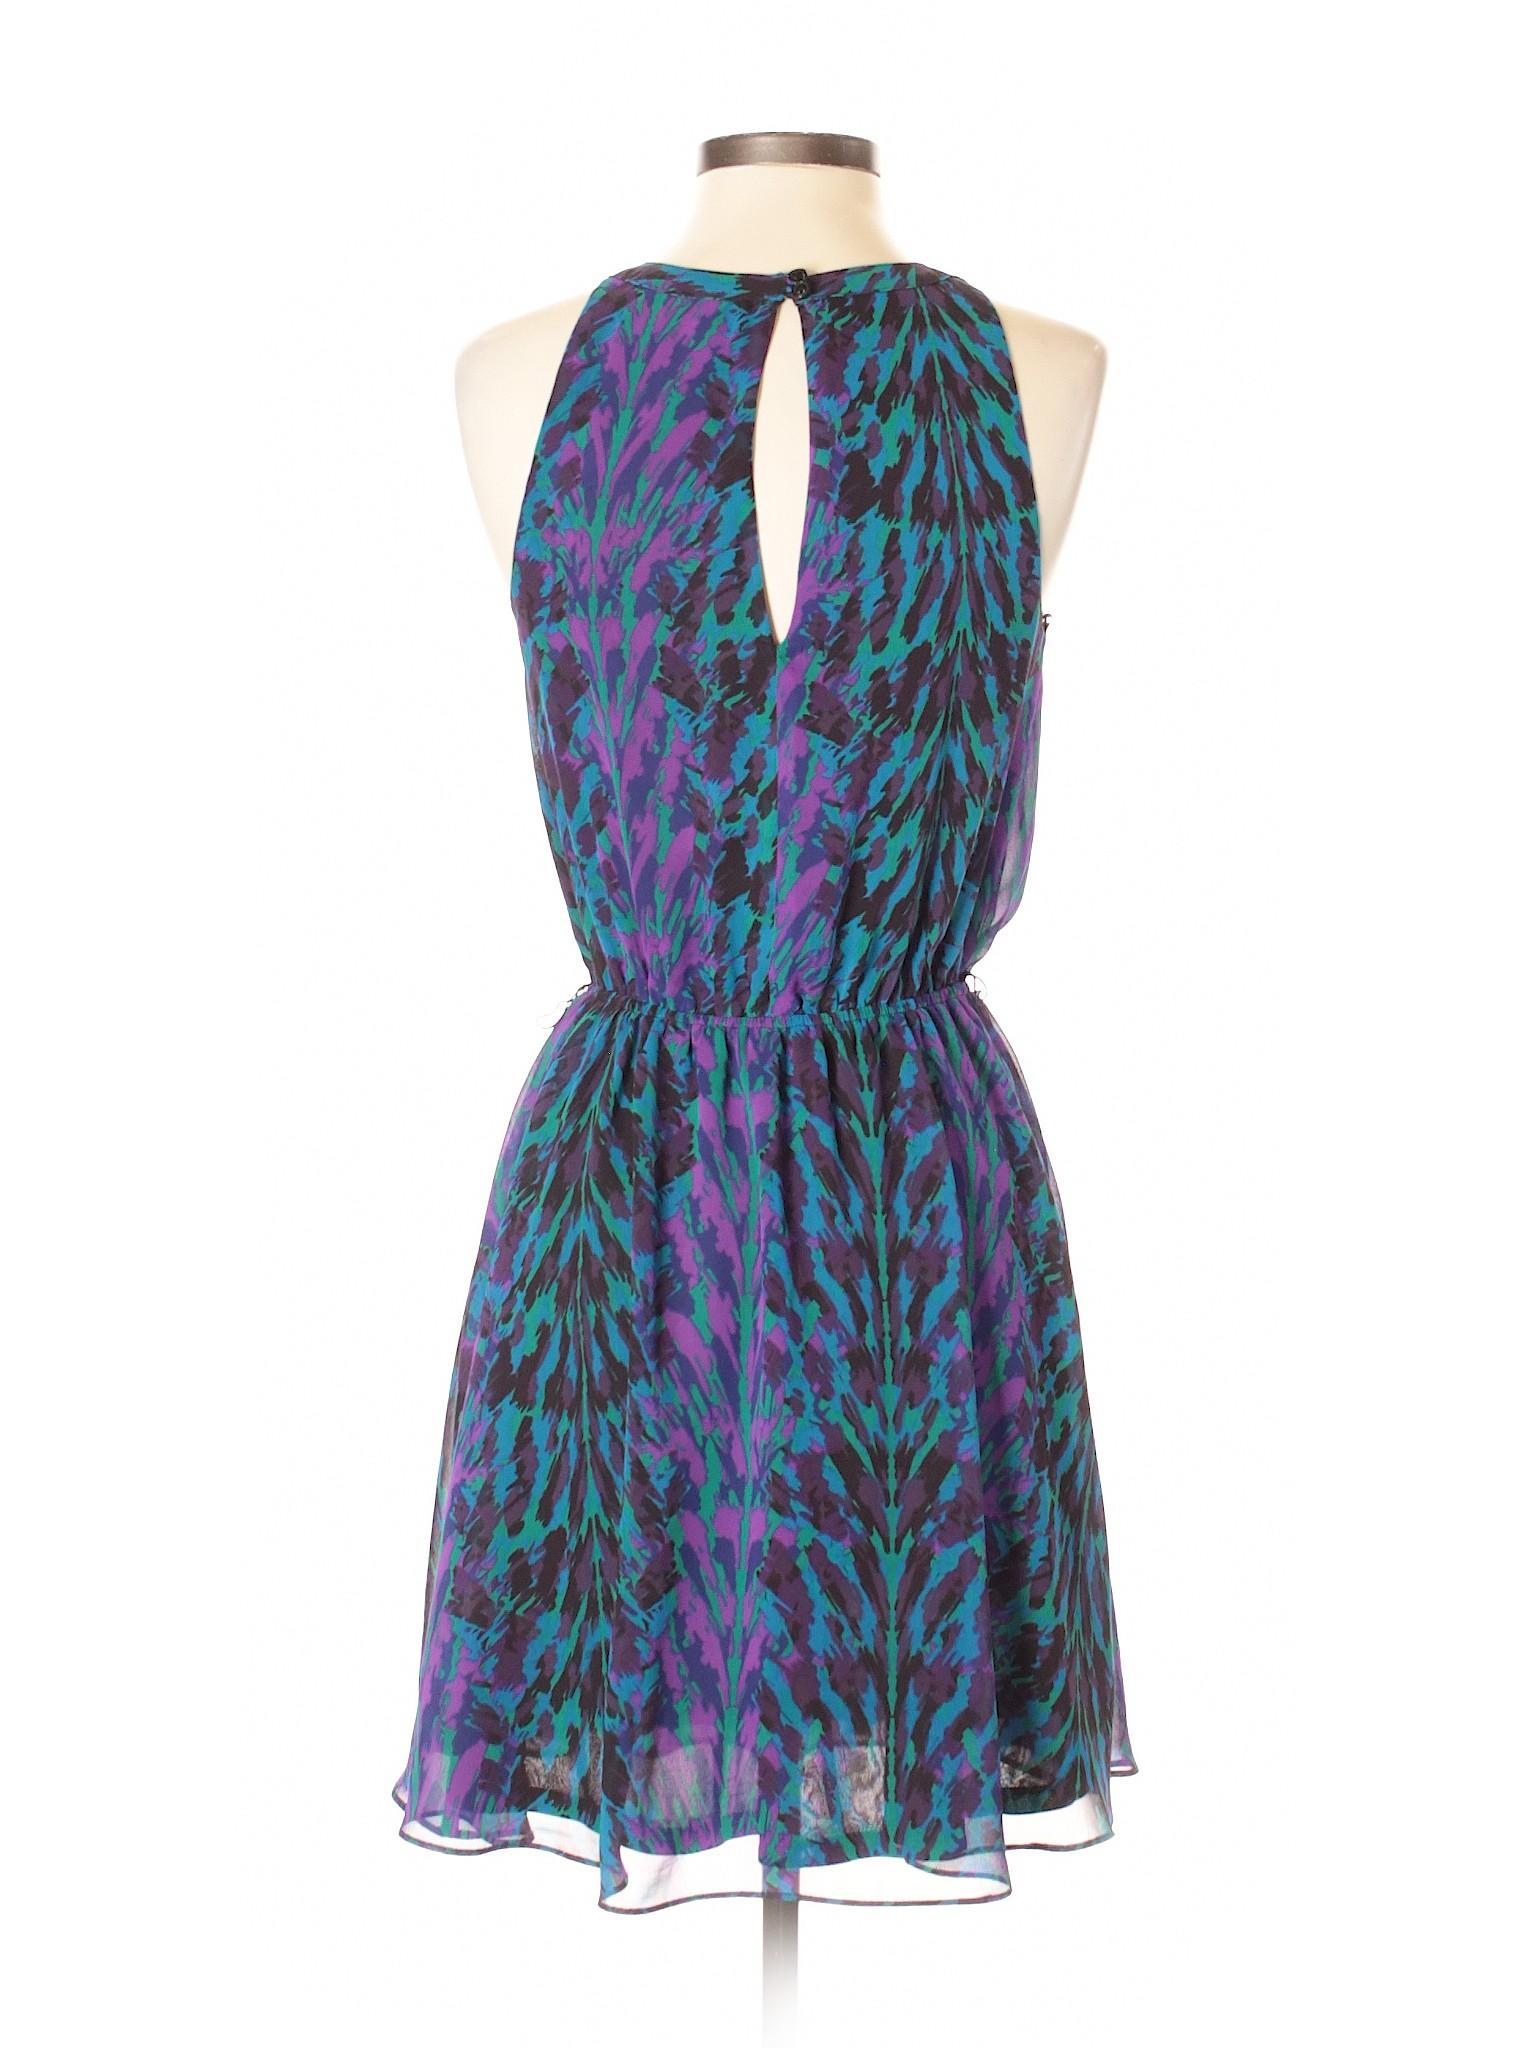 Boutique Dress Express winter Boutique Casual winter Dress Boutique Express Casual 01X0zqwA